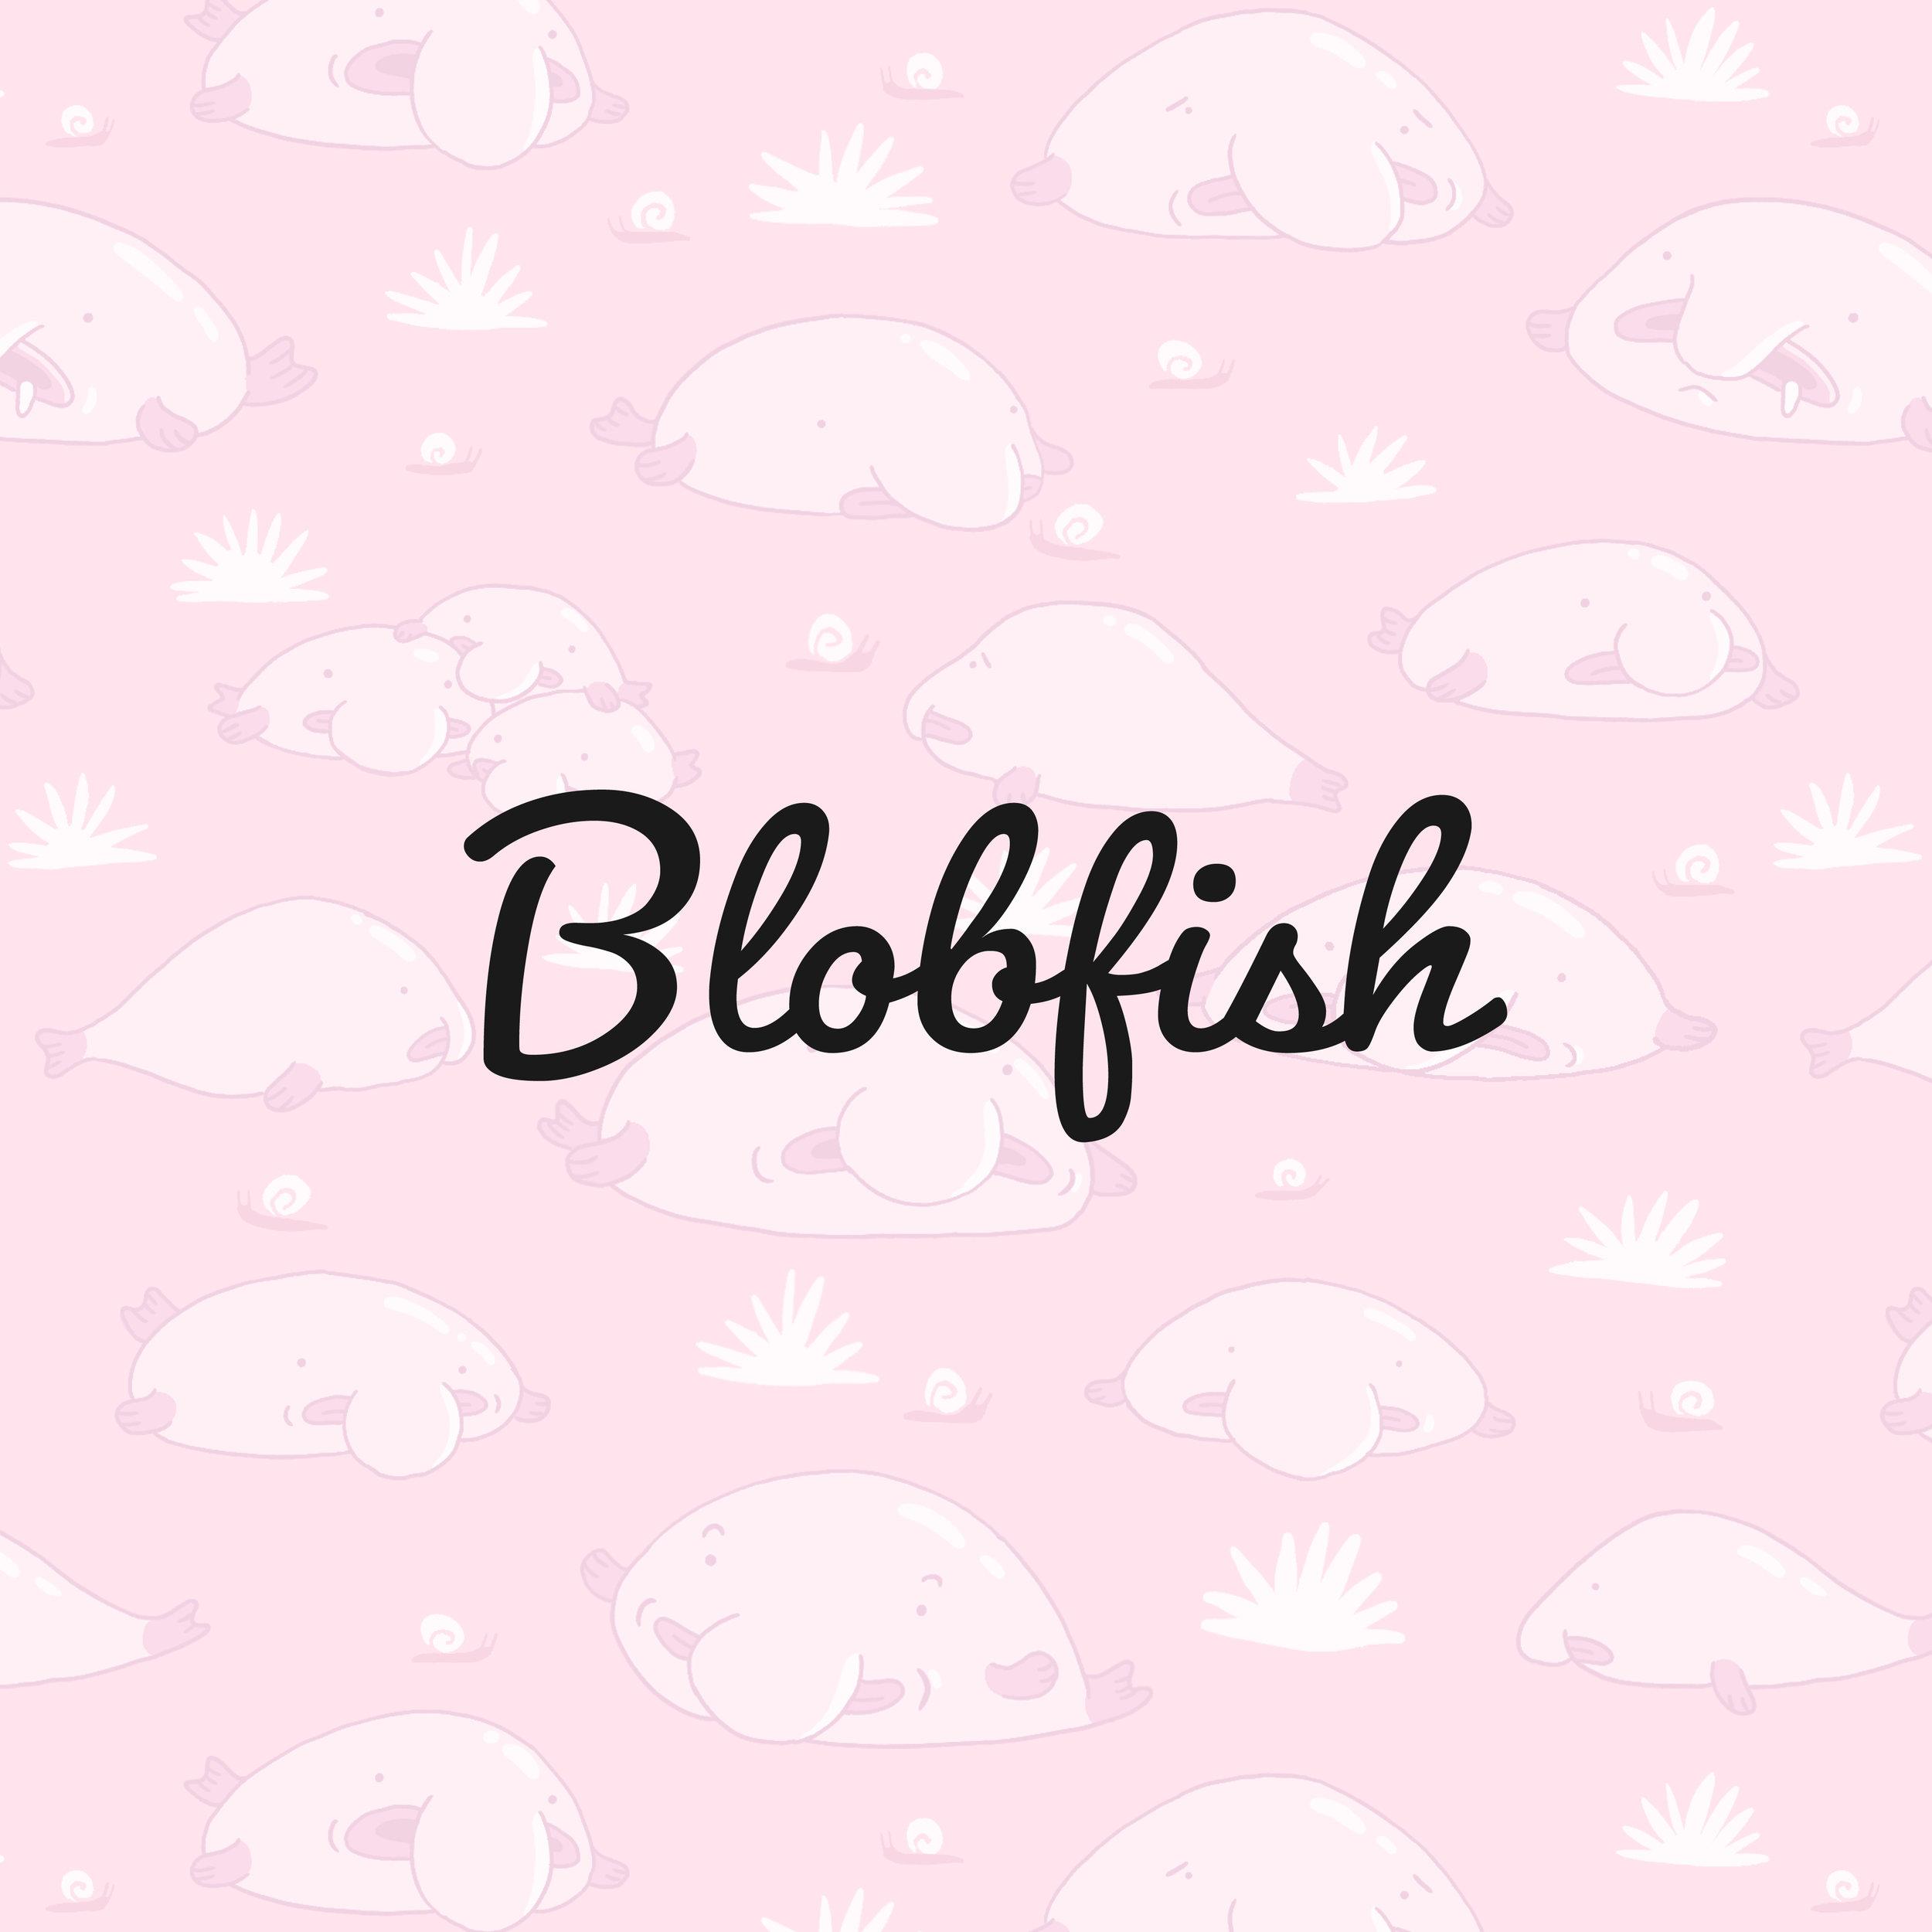 Blobfish_square.jpg